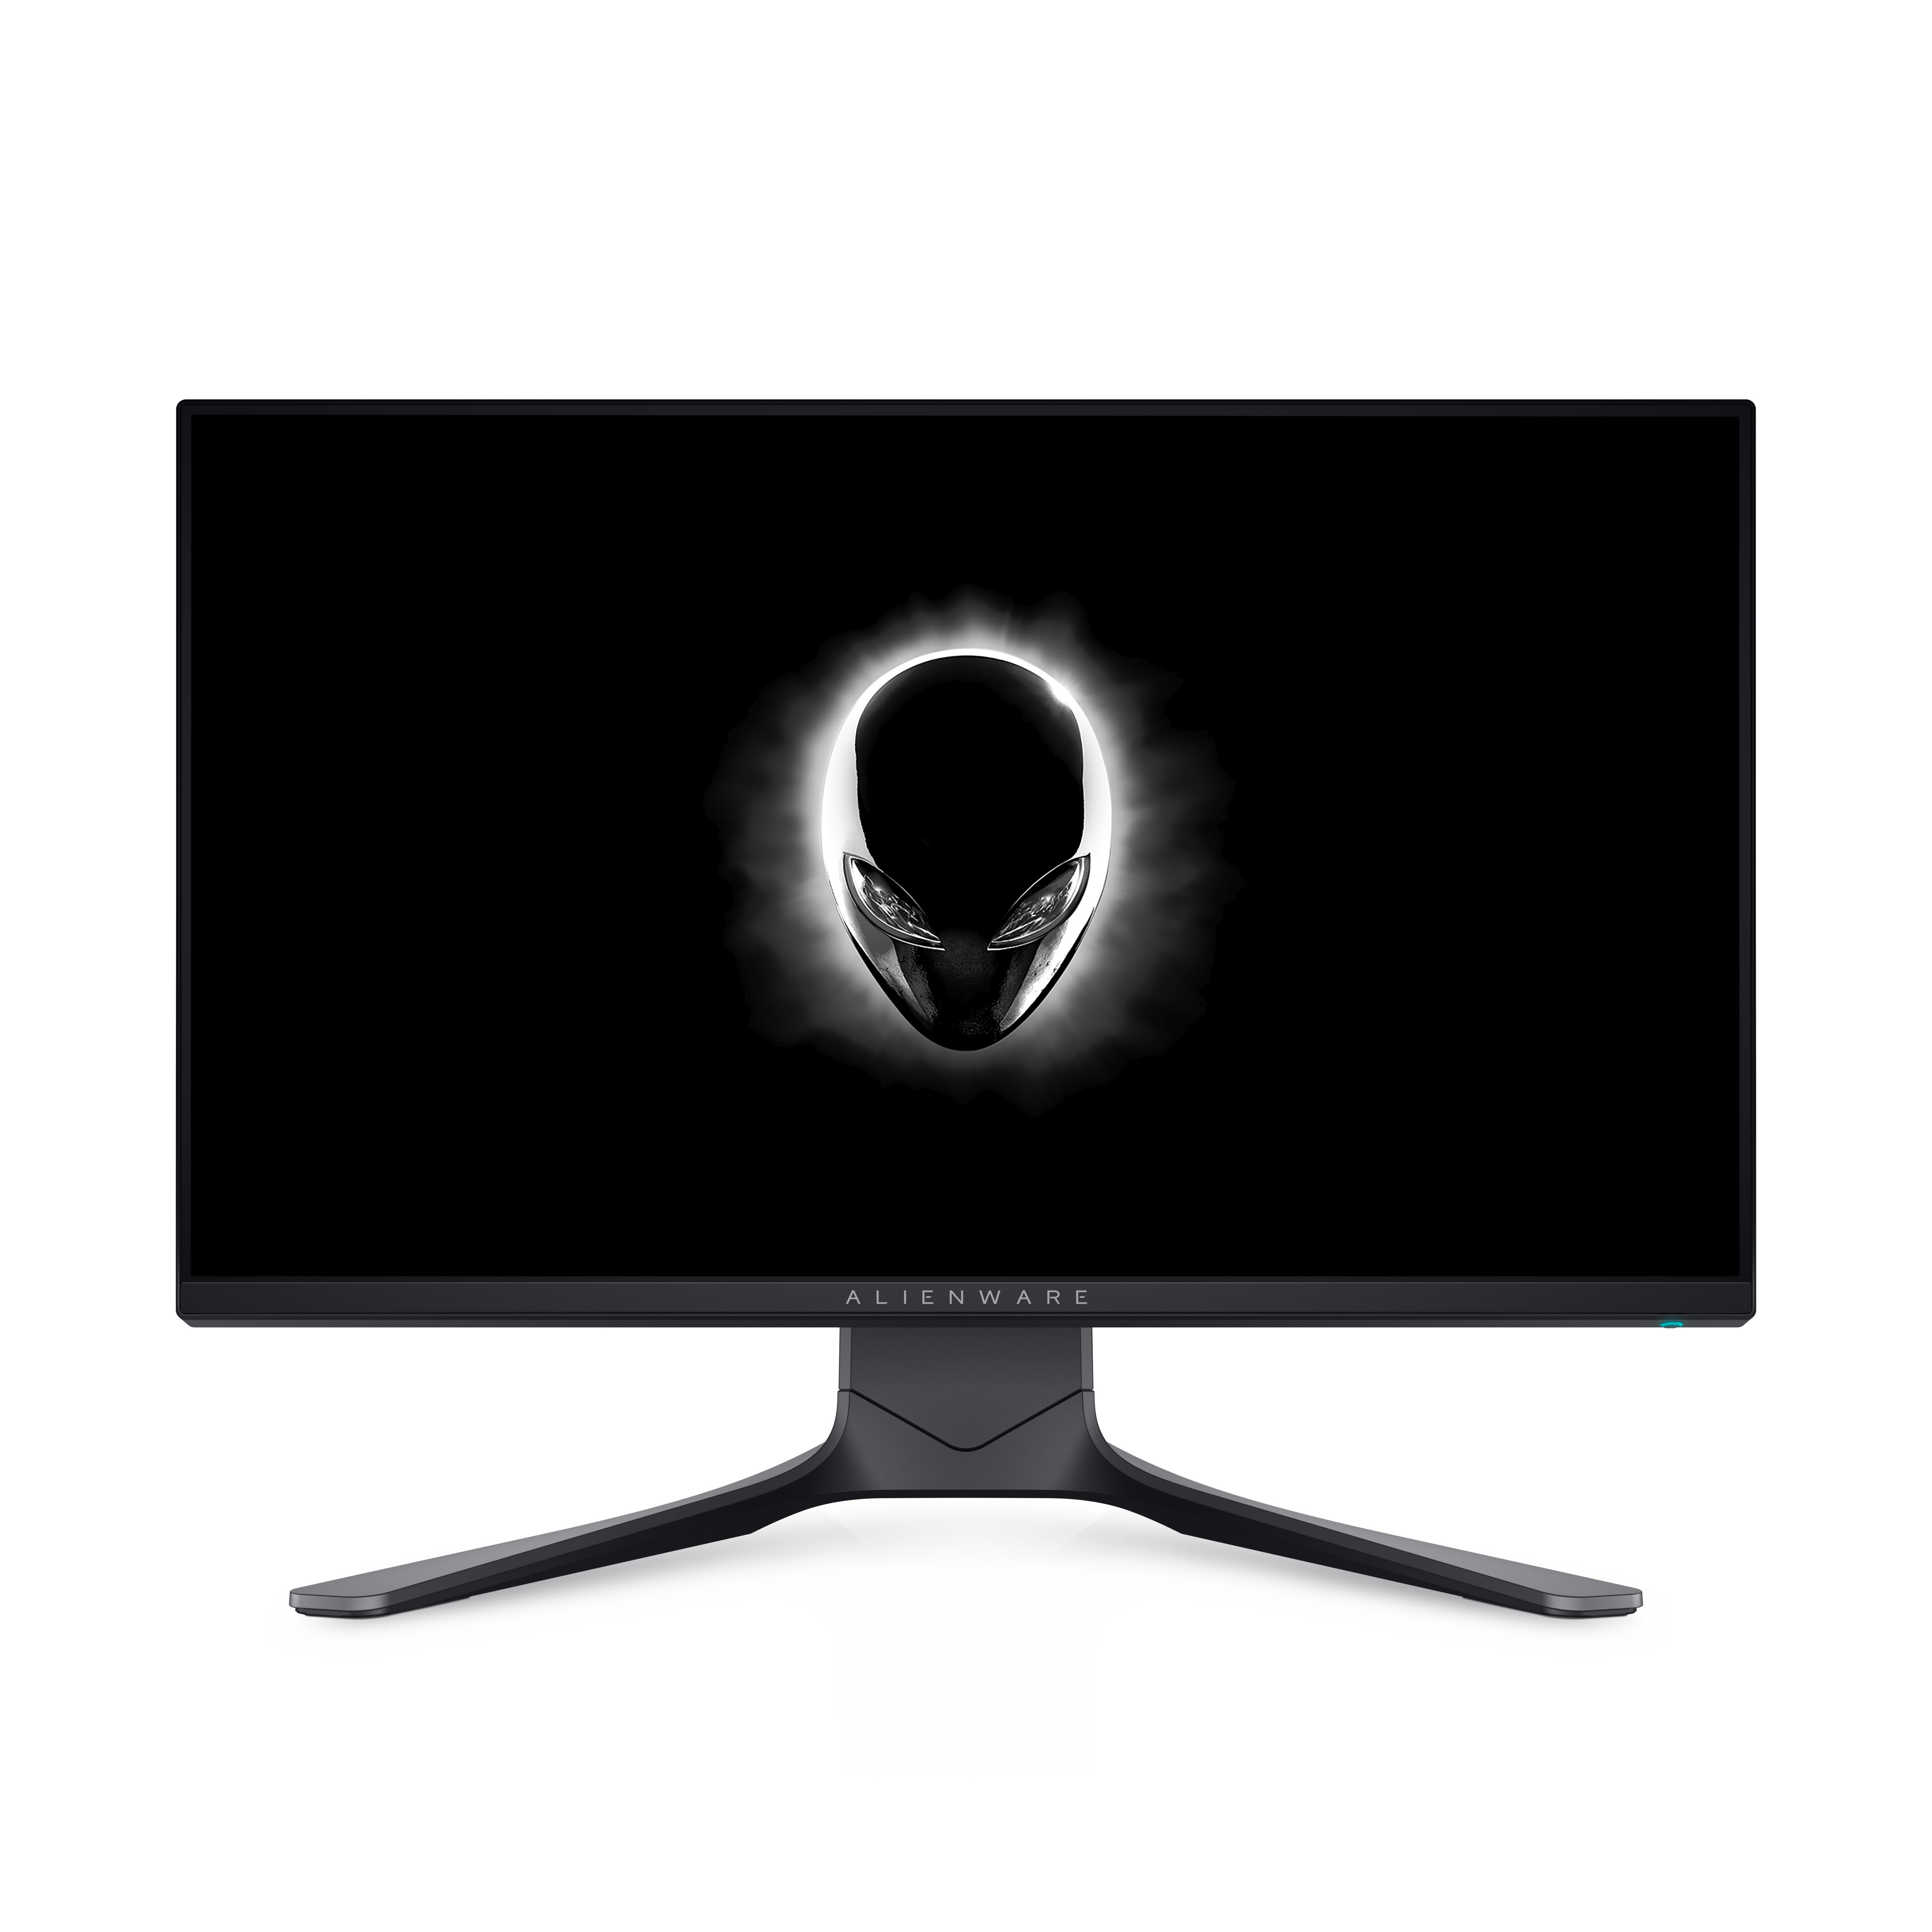 "Alienware AW2521HF 62,2 cm (24.5"") 1920 x 1080 Pixels Full HD LCD Zwart"